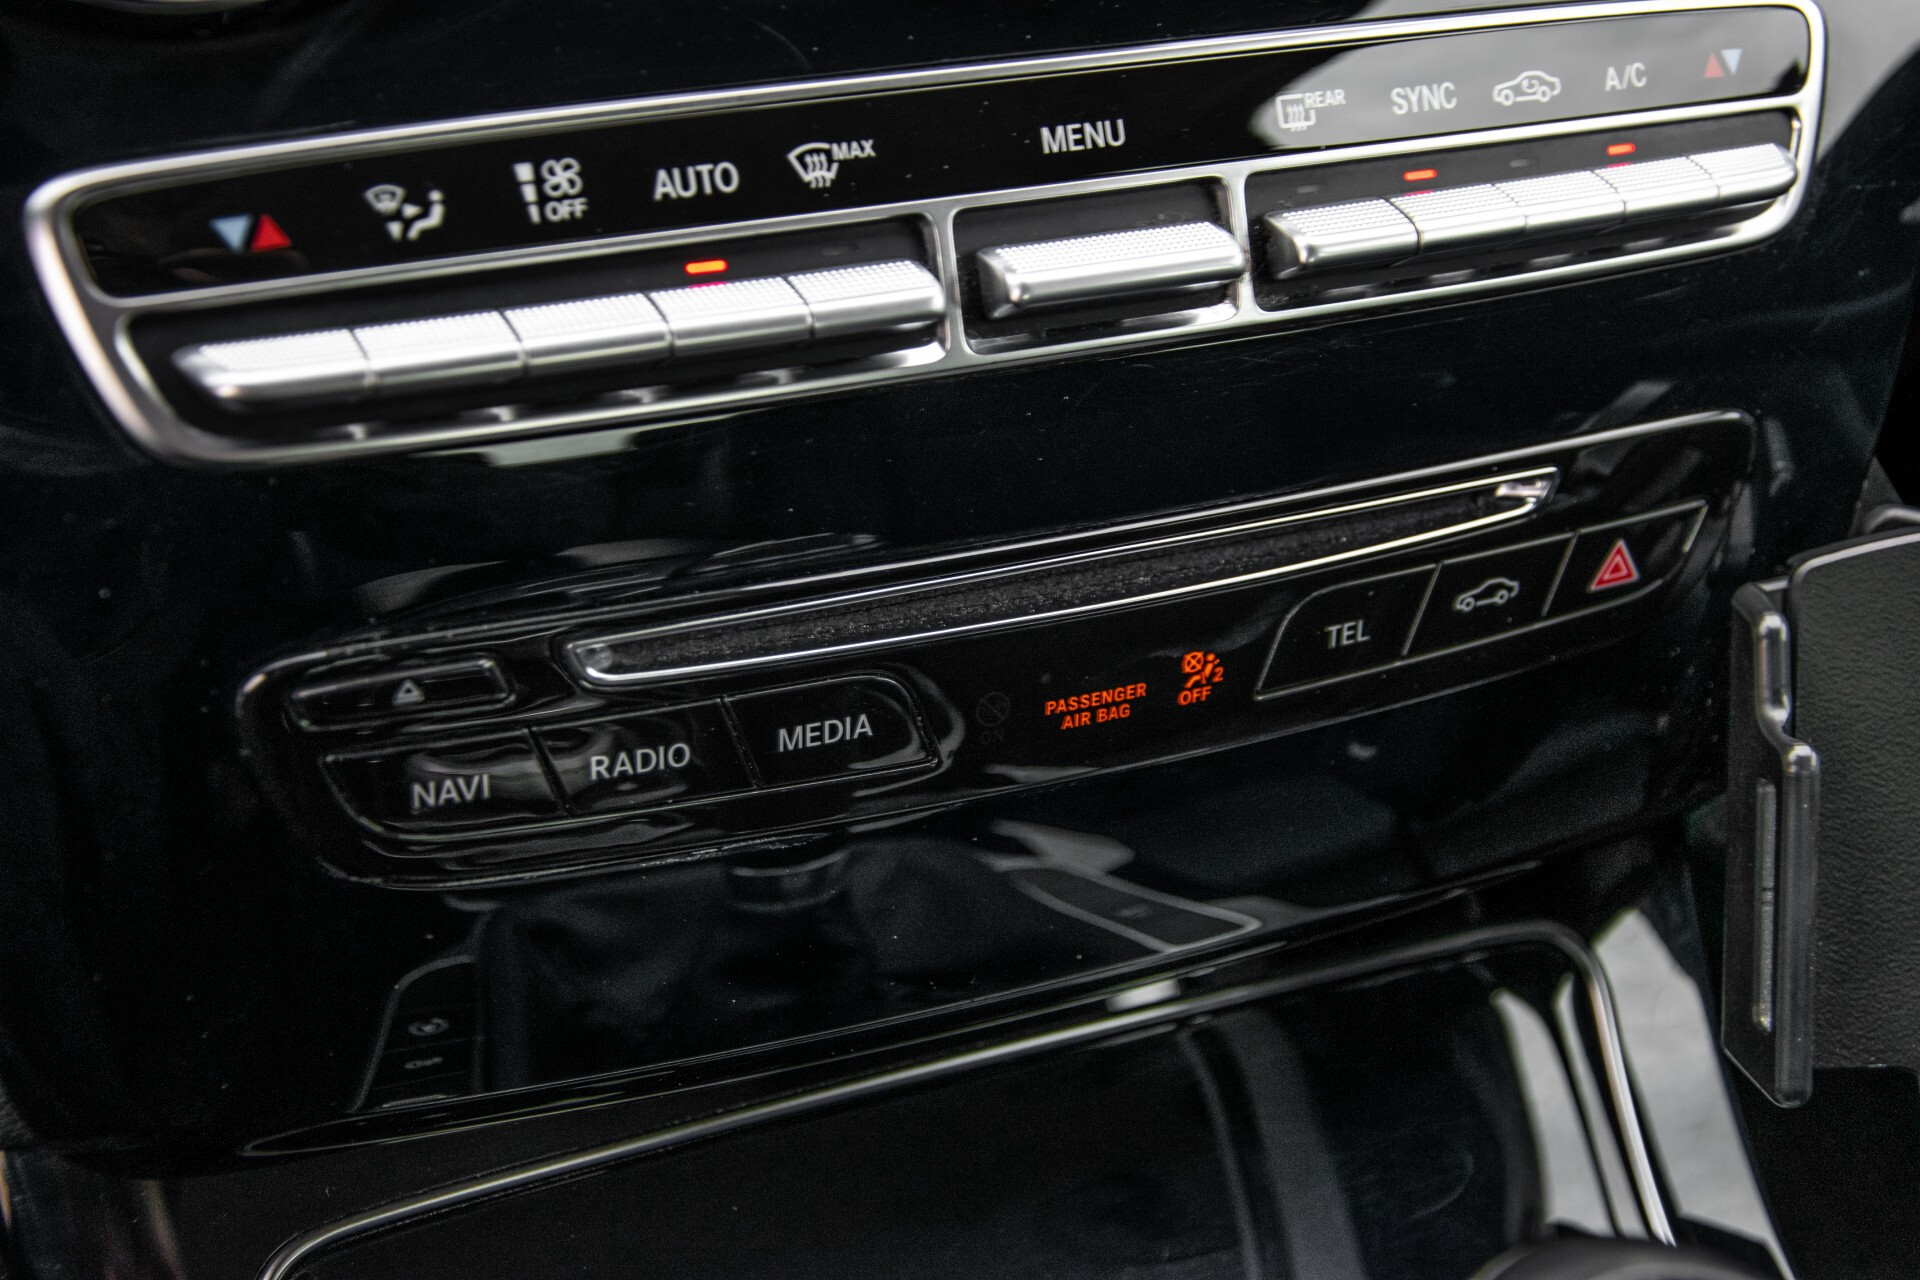 Mercedes-Benz C-Klasse 180 Bluetec Lease Edition Intelligent Light System/Cruise Control/Navi Foto 19